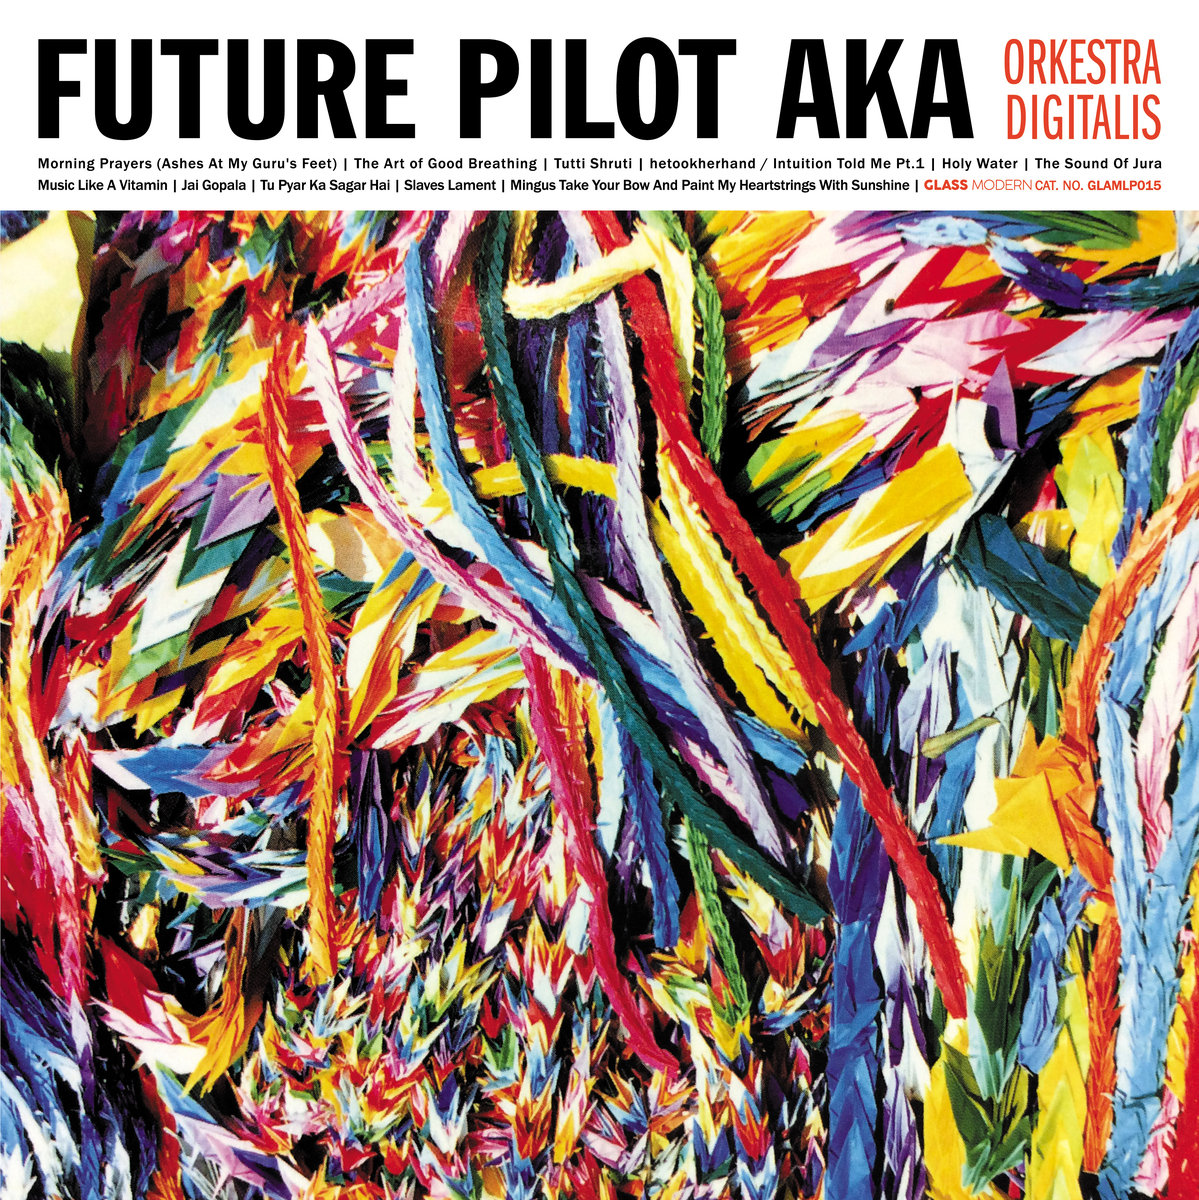 A Stunning Swan Song: Future Pilot AKA's Orkestra Digitalis